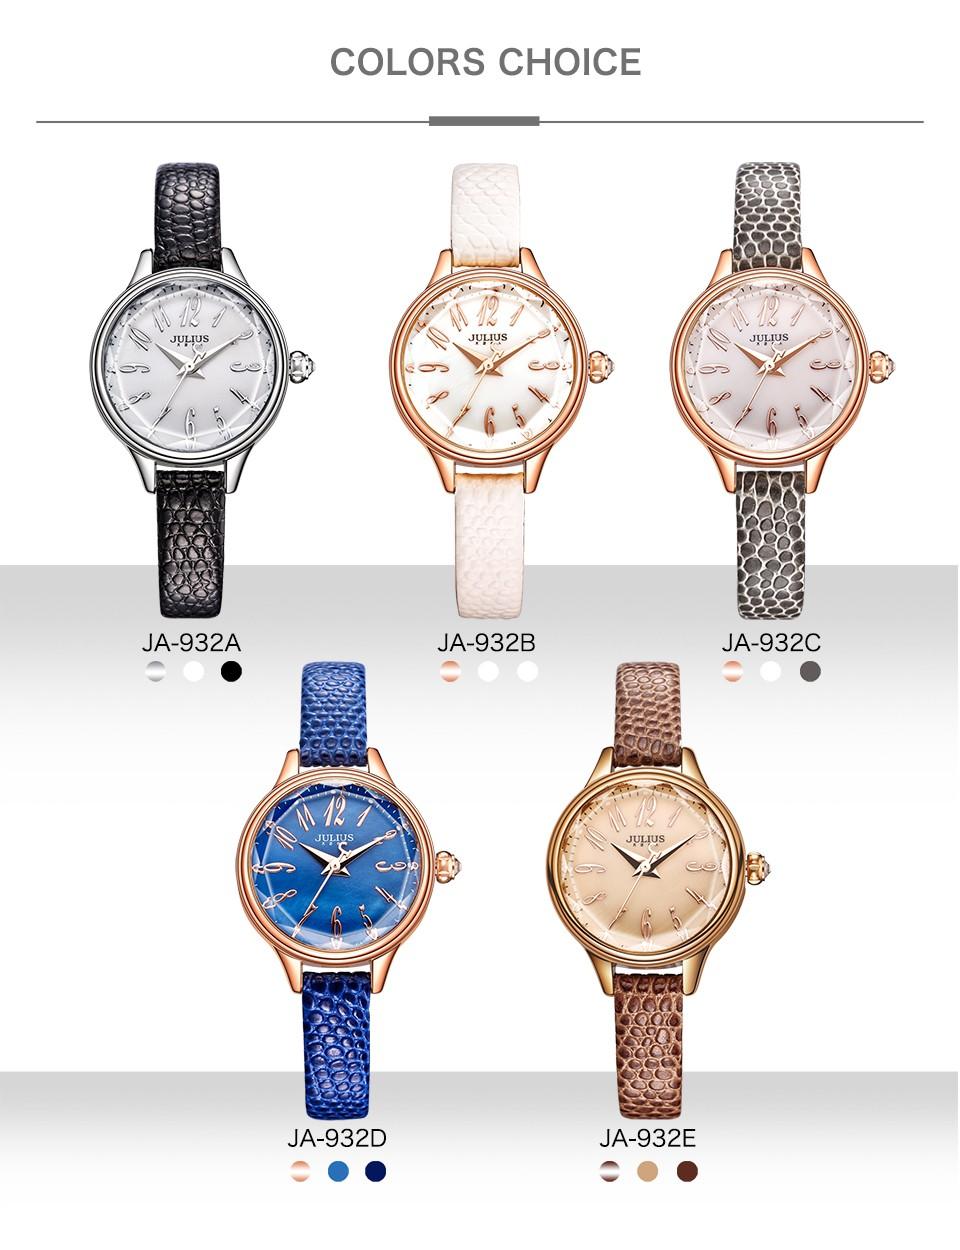 JULIUS 2017 Winter New Crocodile Genuine Leather Strap Rose Gold Watches Women Lady Fashion Dress Wrist Watch Hours Clock JA-932